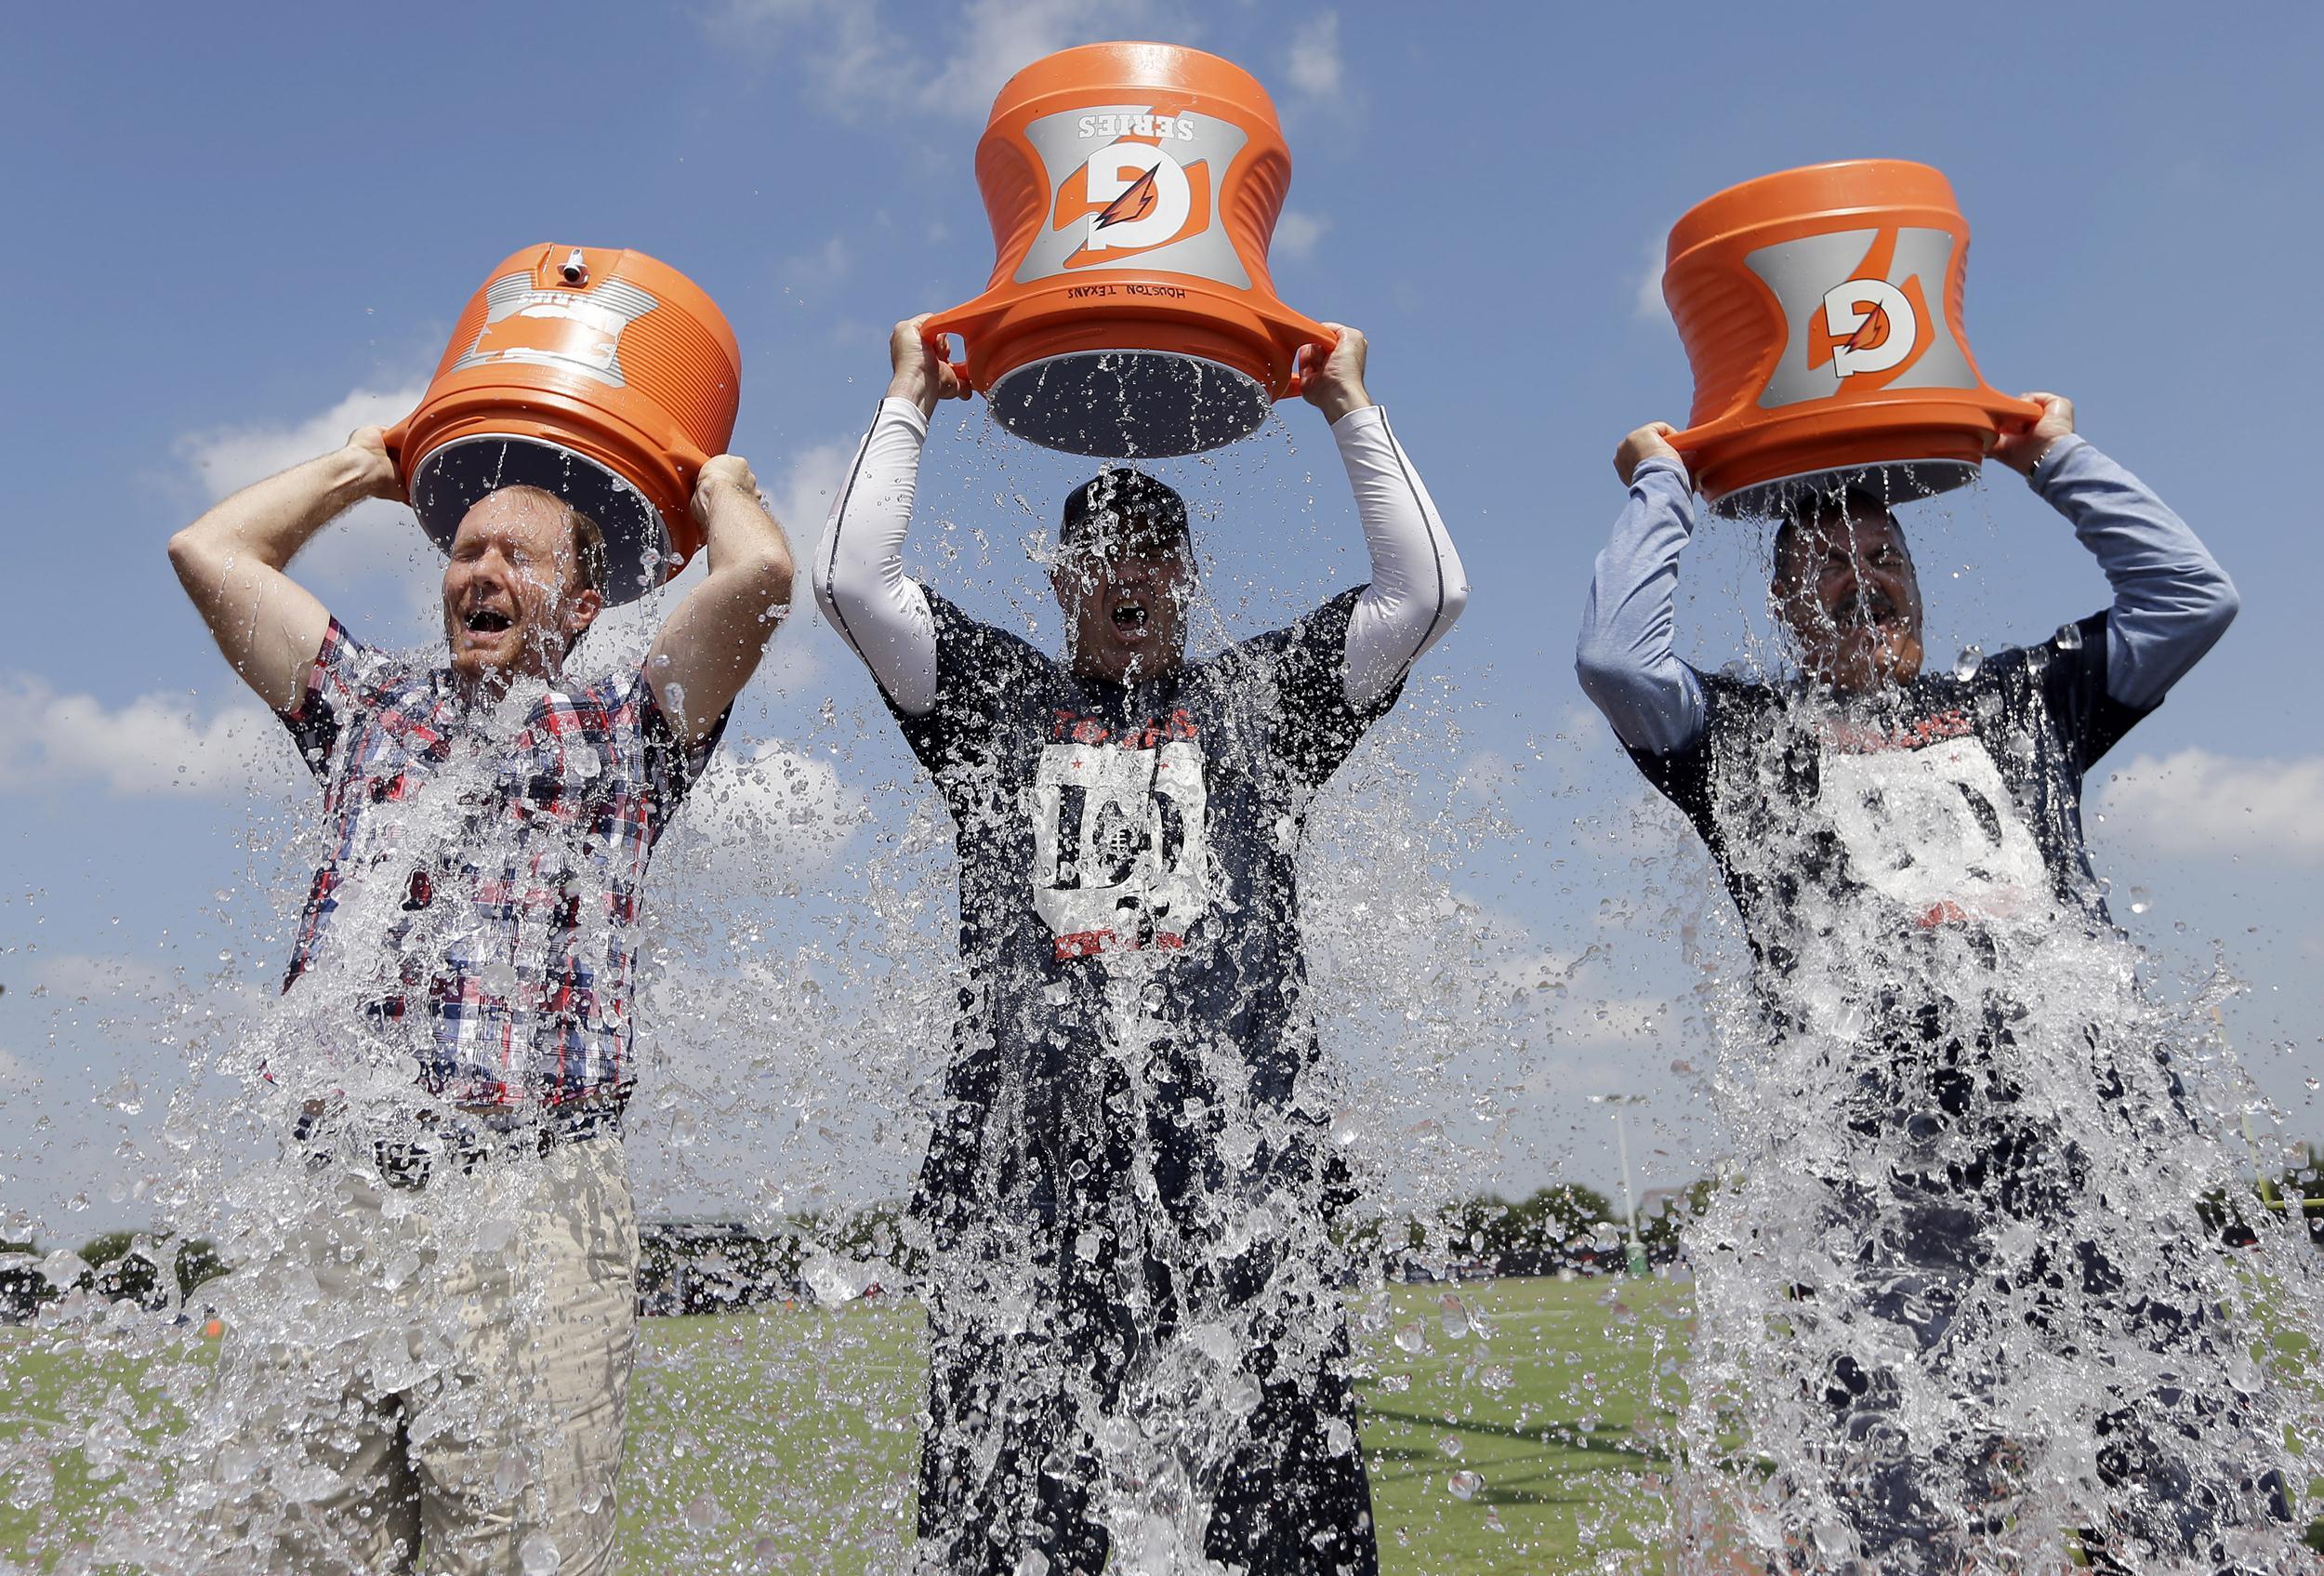 140819-ice-bucket-challenge-1949_899e03e1c58b45b56812f96bc79680a6.jpg